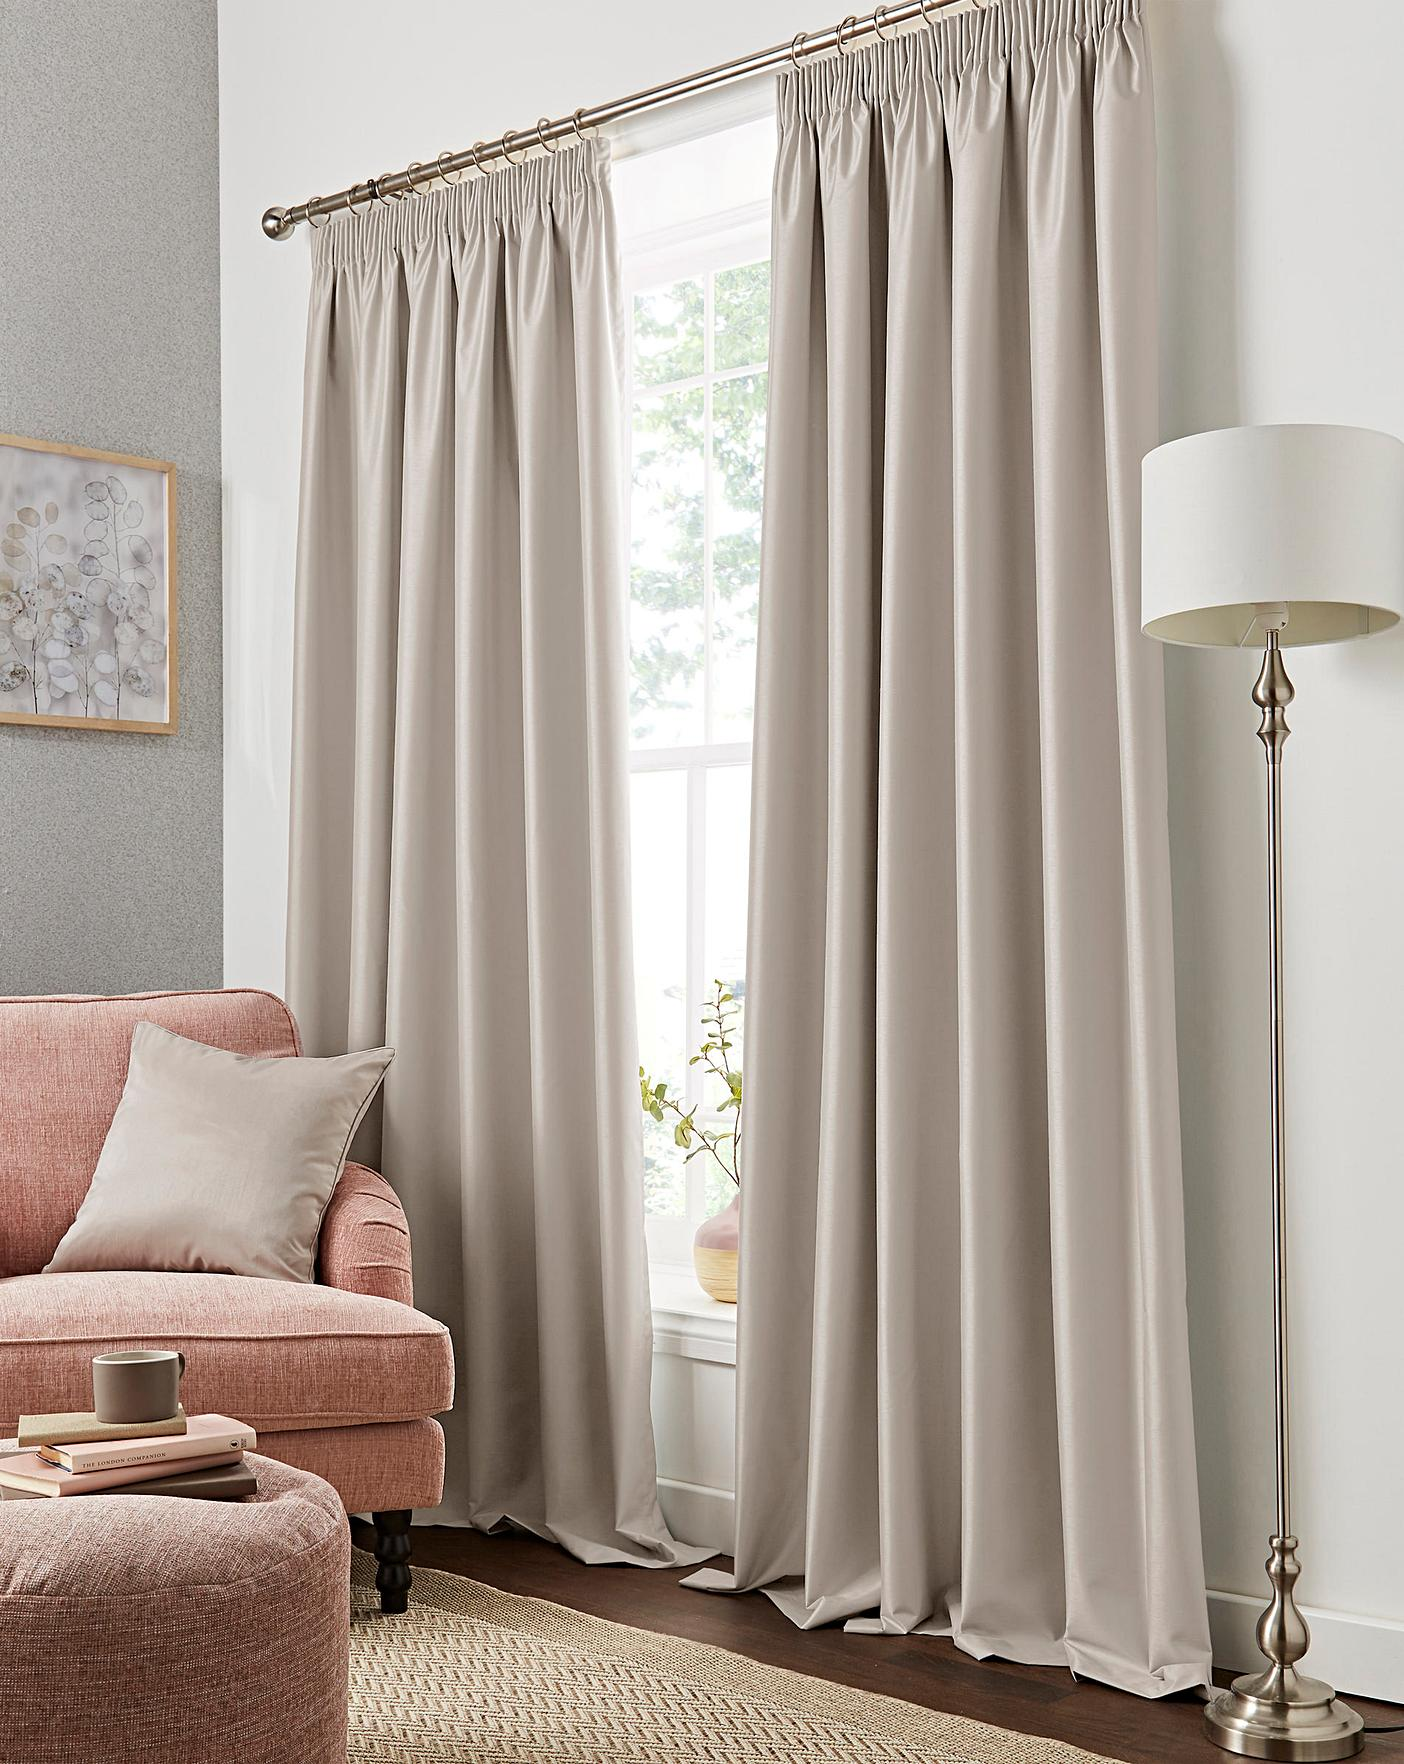 Faux Silk Pencil Pleat Blackout Curtains Simply Be